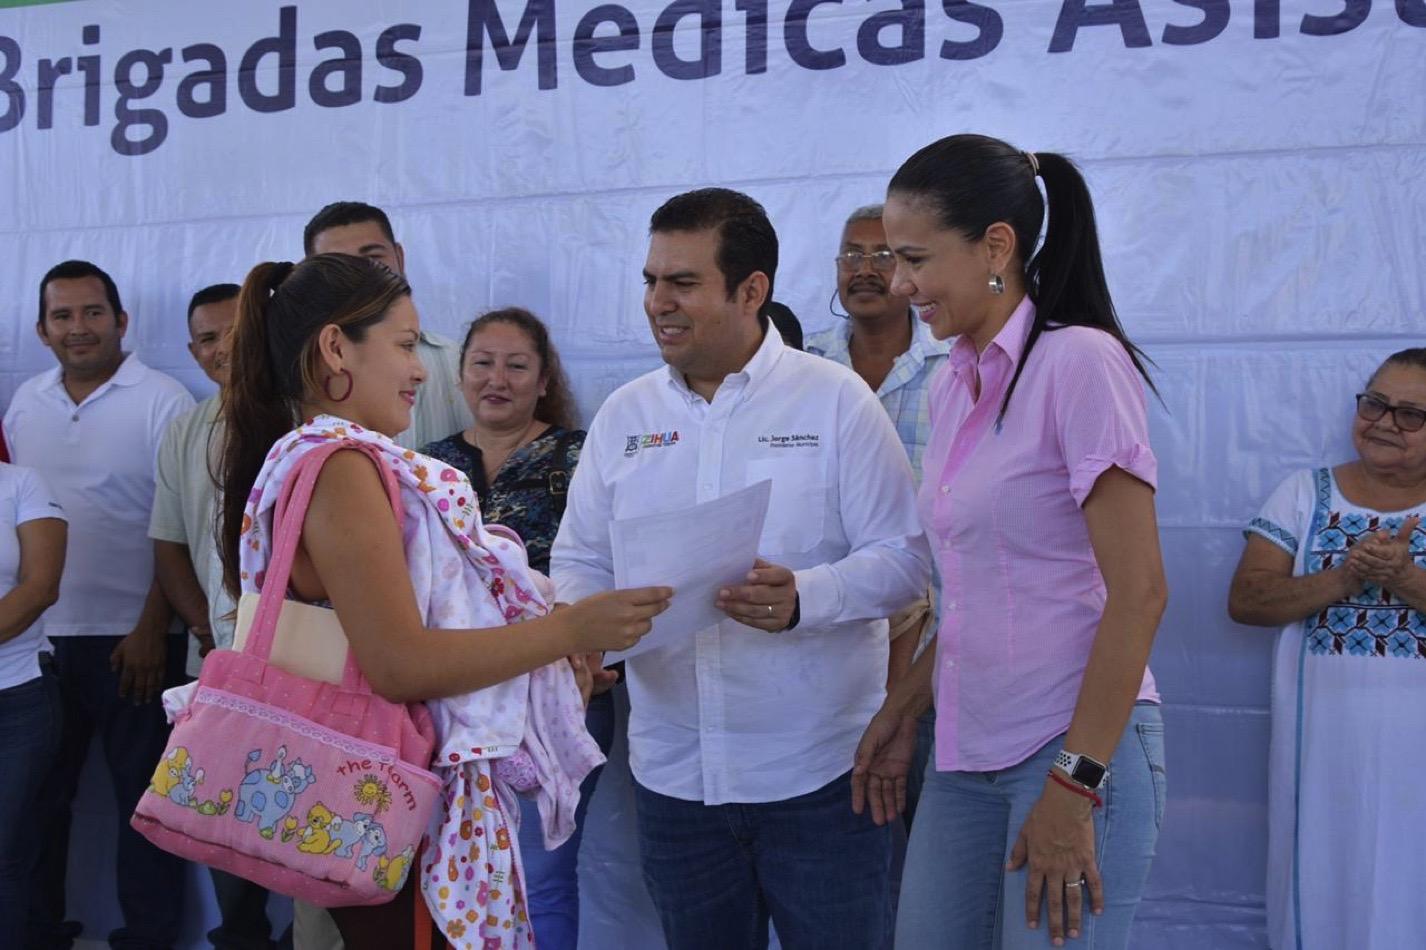 brigadas-medicas-pantla-zihuatanejo.jpg